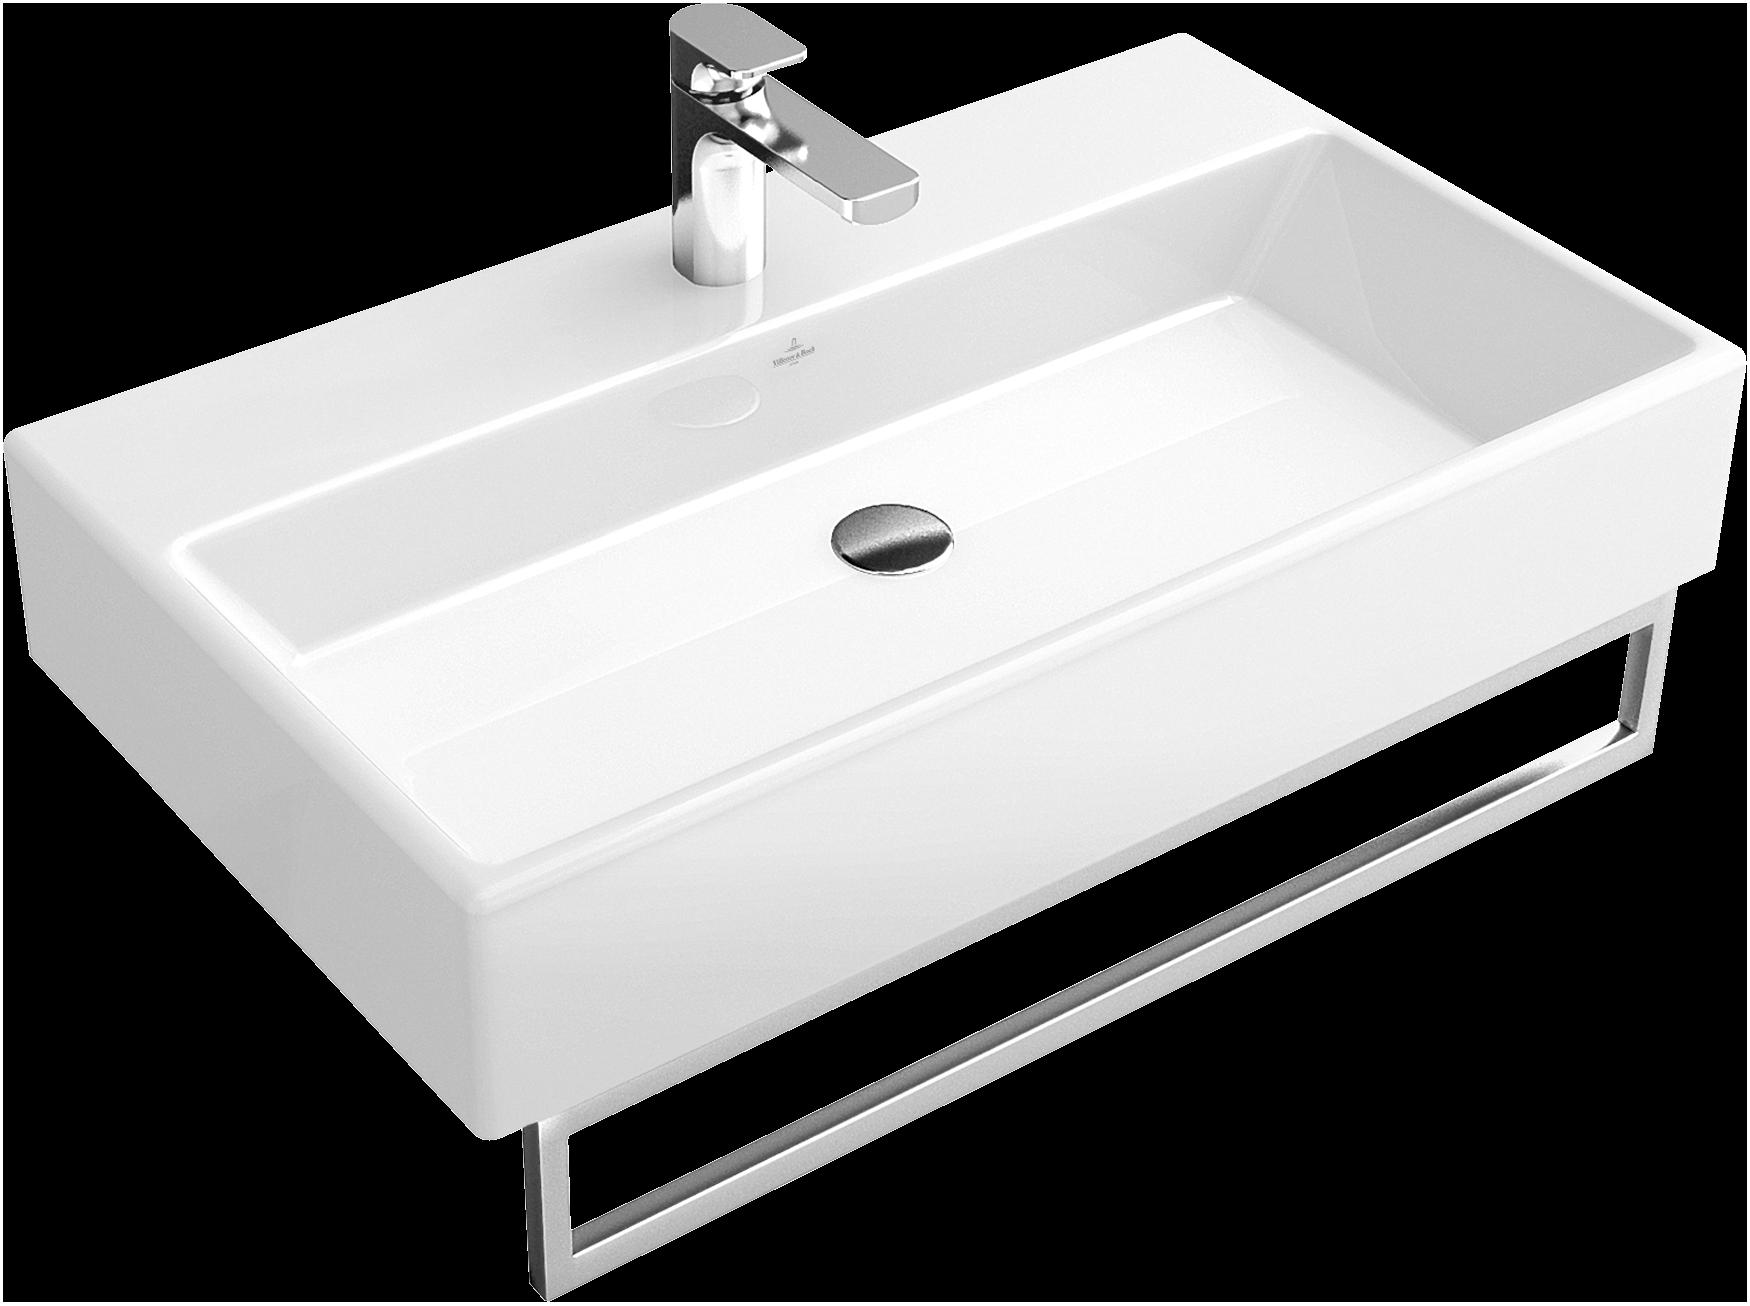 Memento Washbasin Angular 513386 - Villeroy & Boch